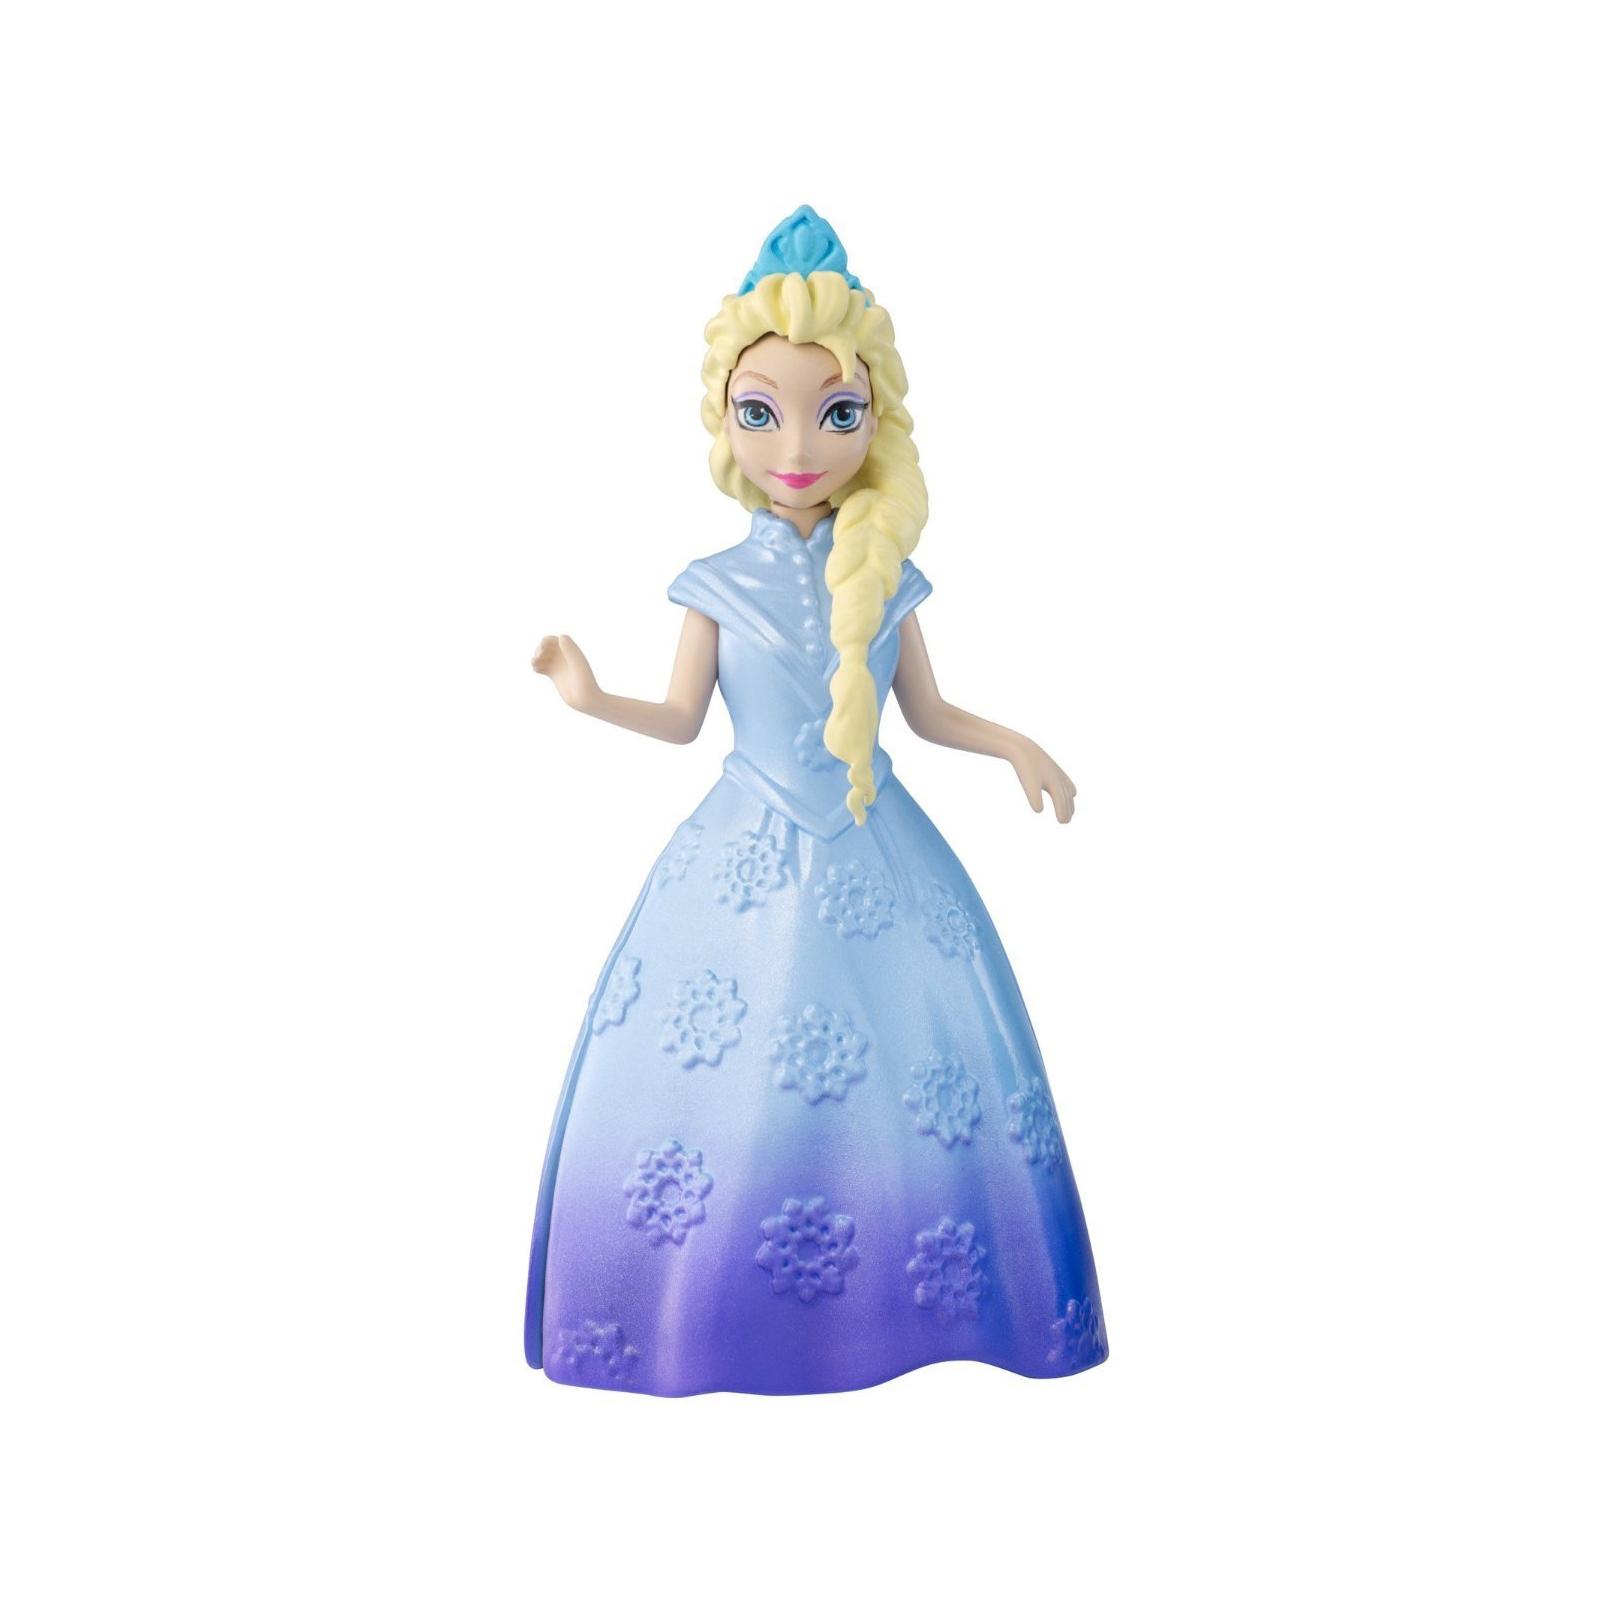 Кукла Mattel Эльза из м/ф Ледяное сердце (Y9969-2)